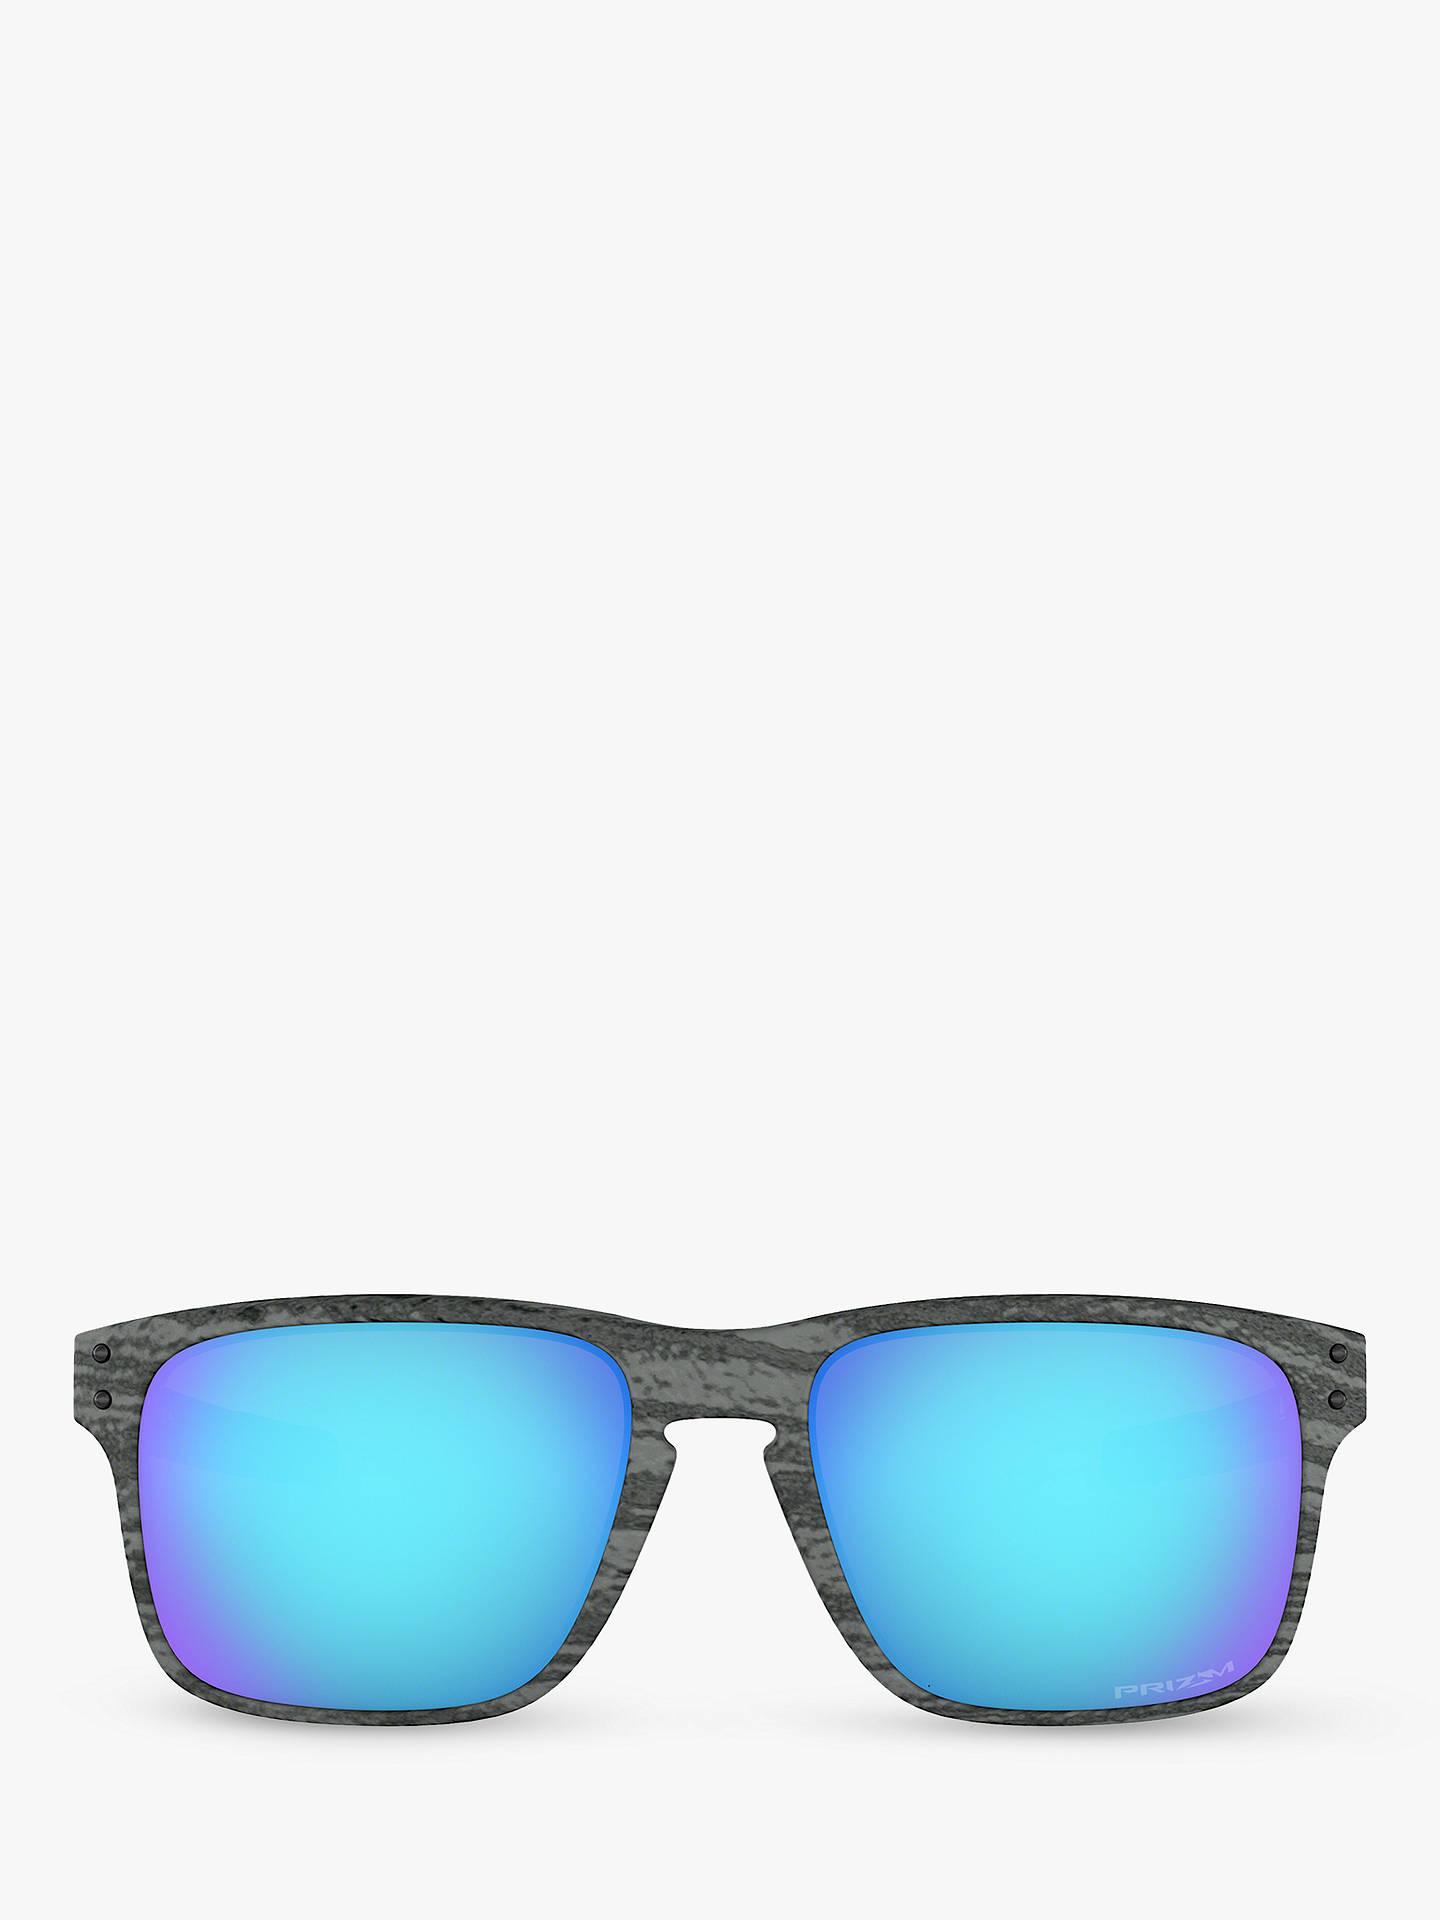 23cec02e3d BuyOakley OO9384 Men s Holbrook Prizm Rectangular Sunglasses